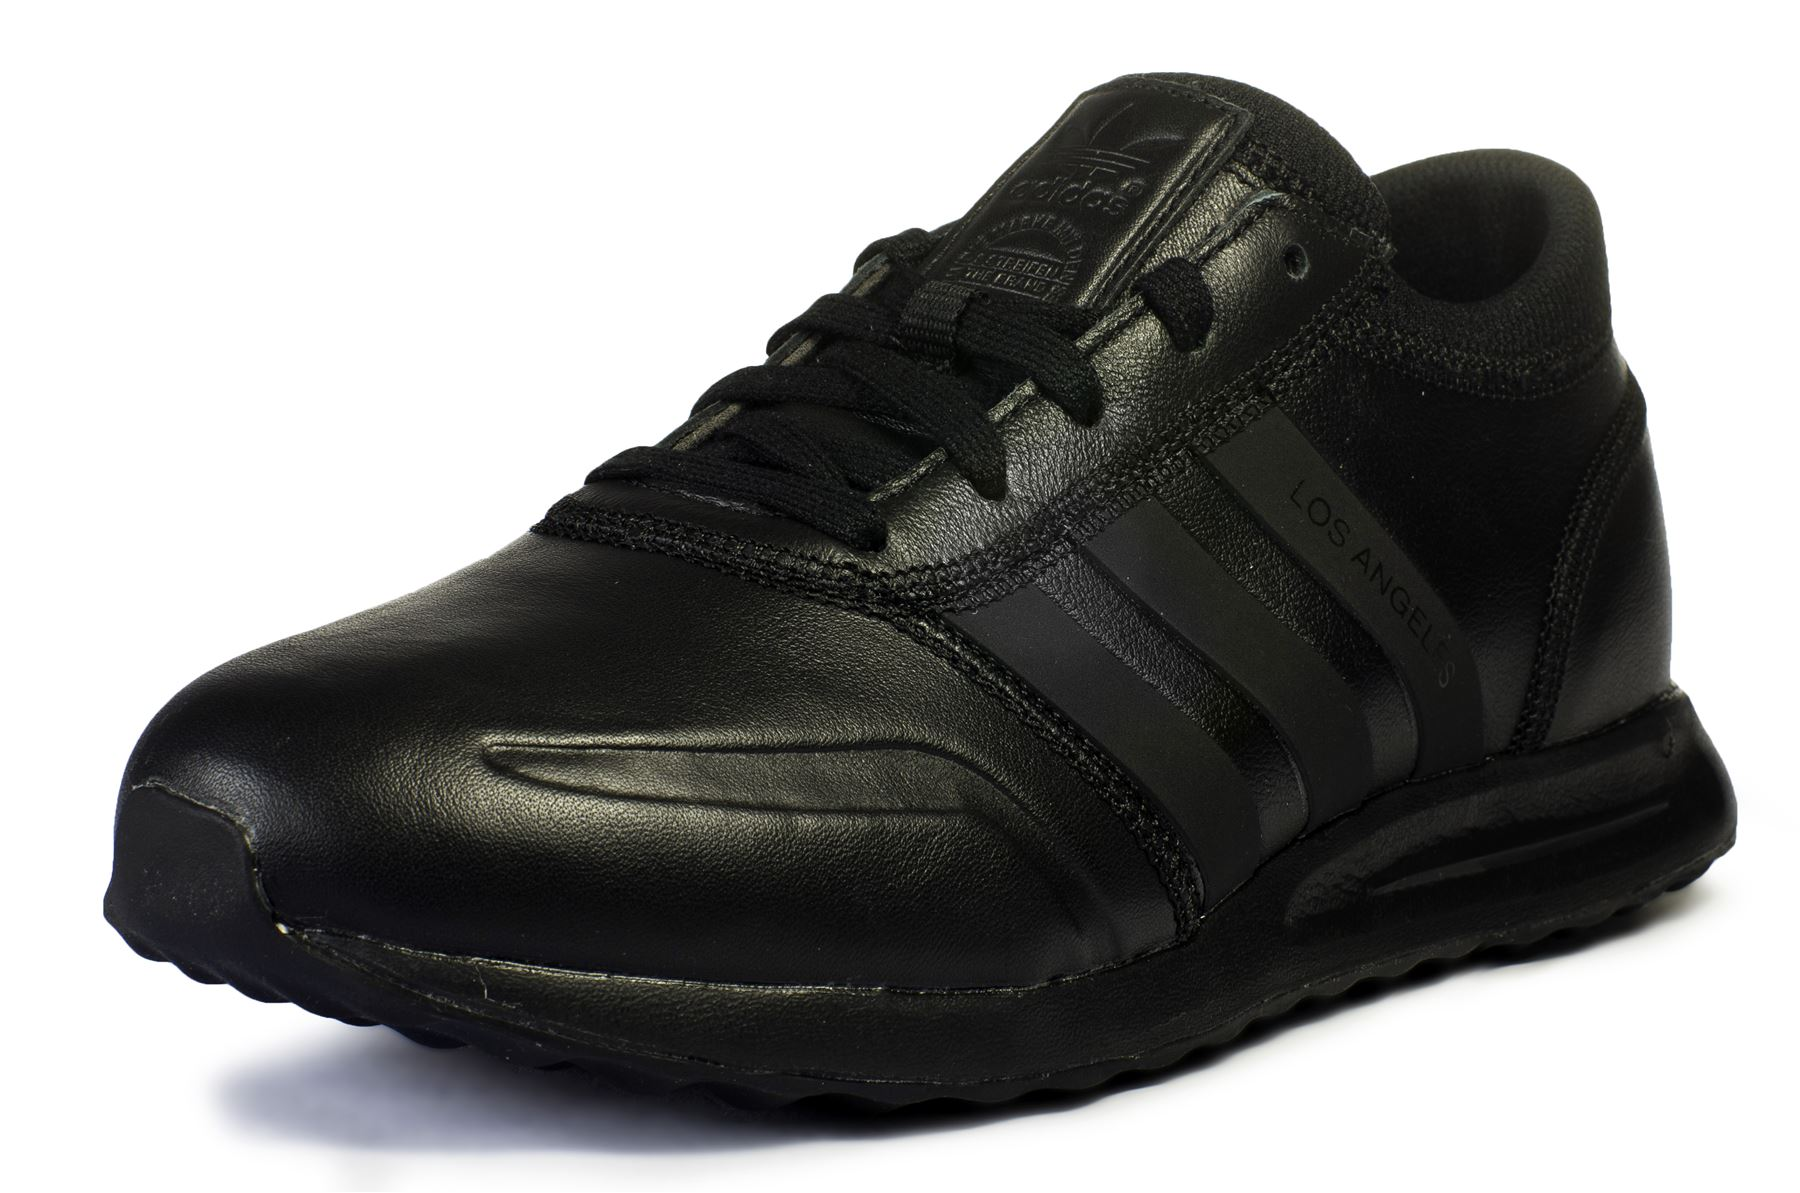 adidas trainer nere pelle